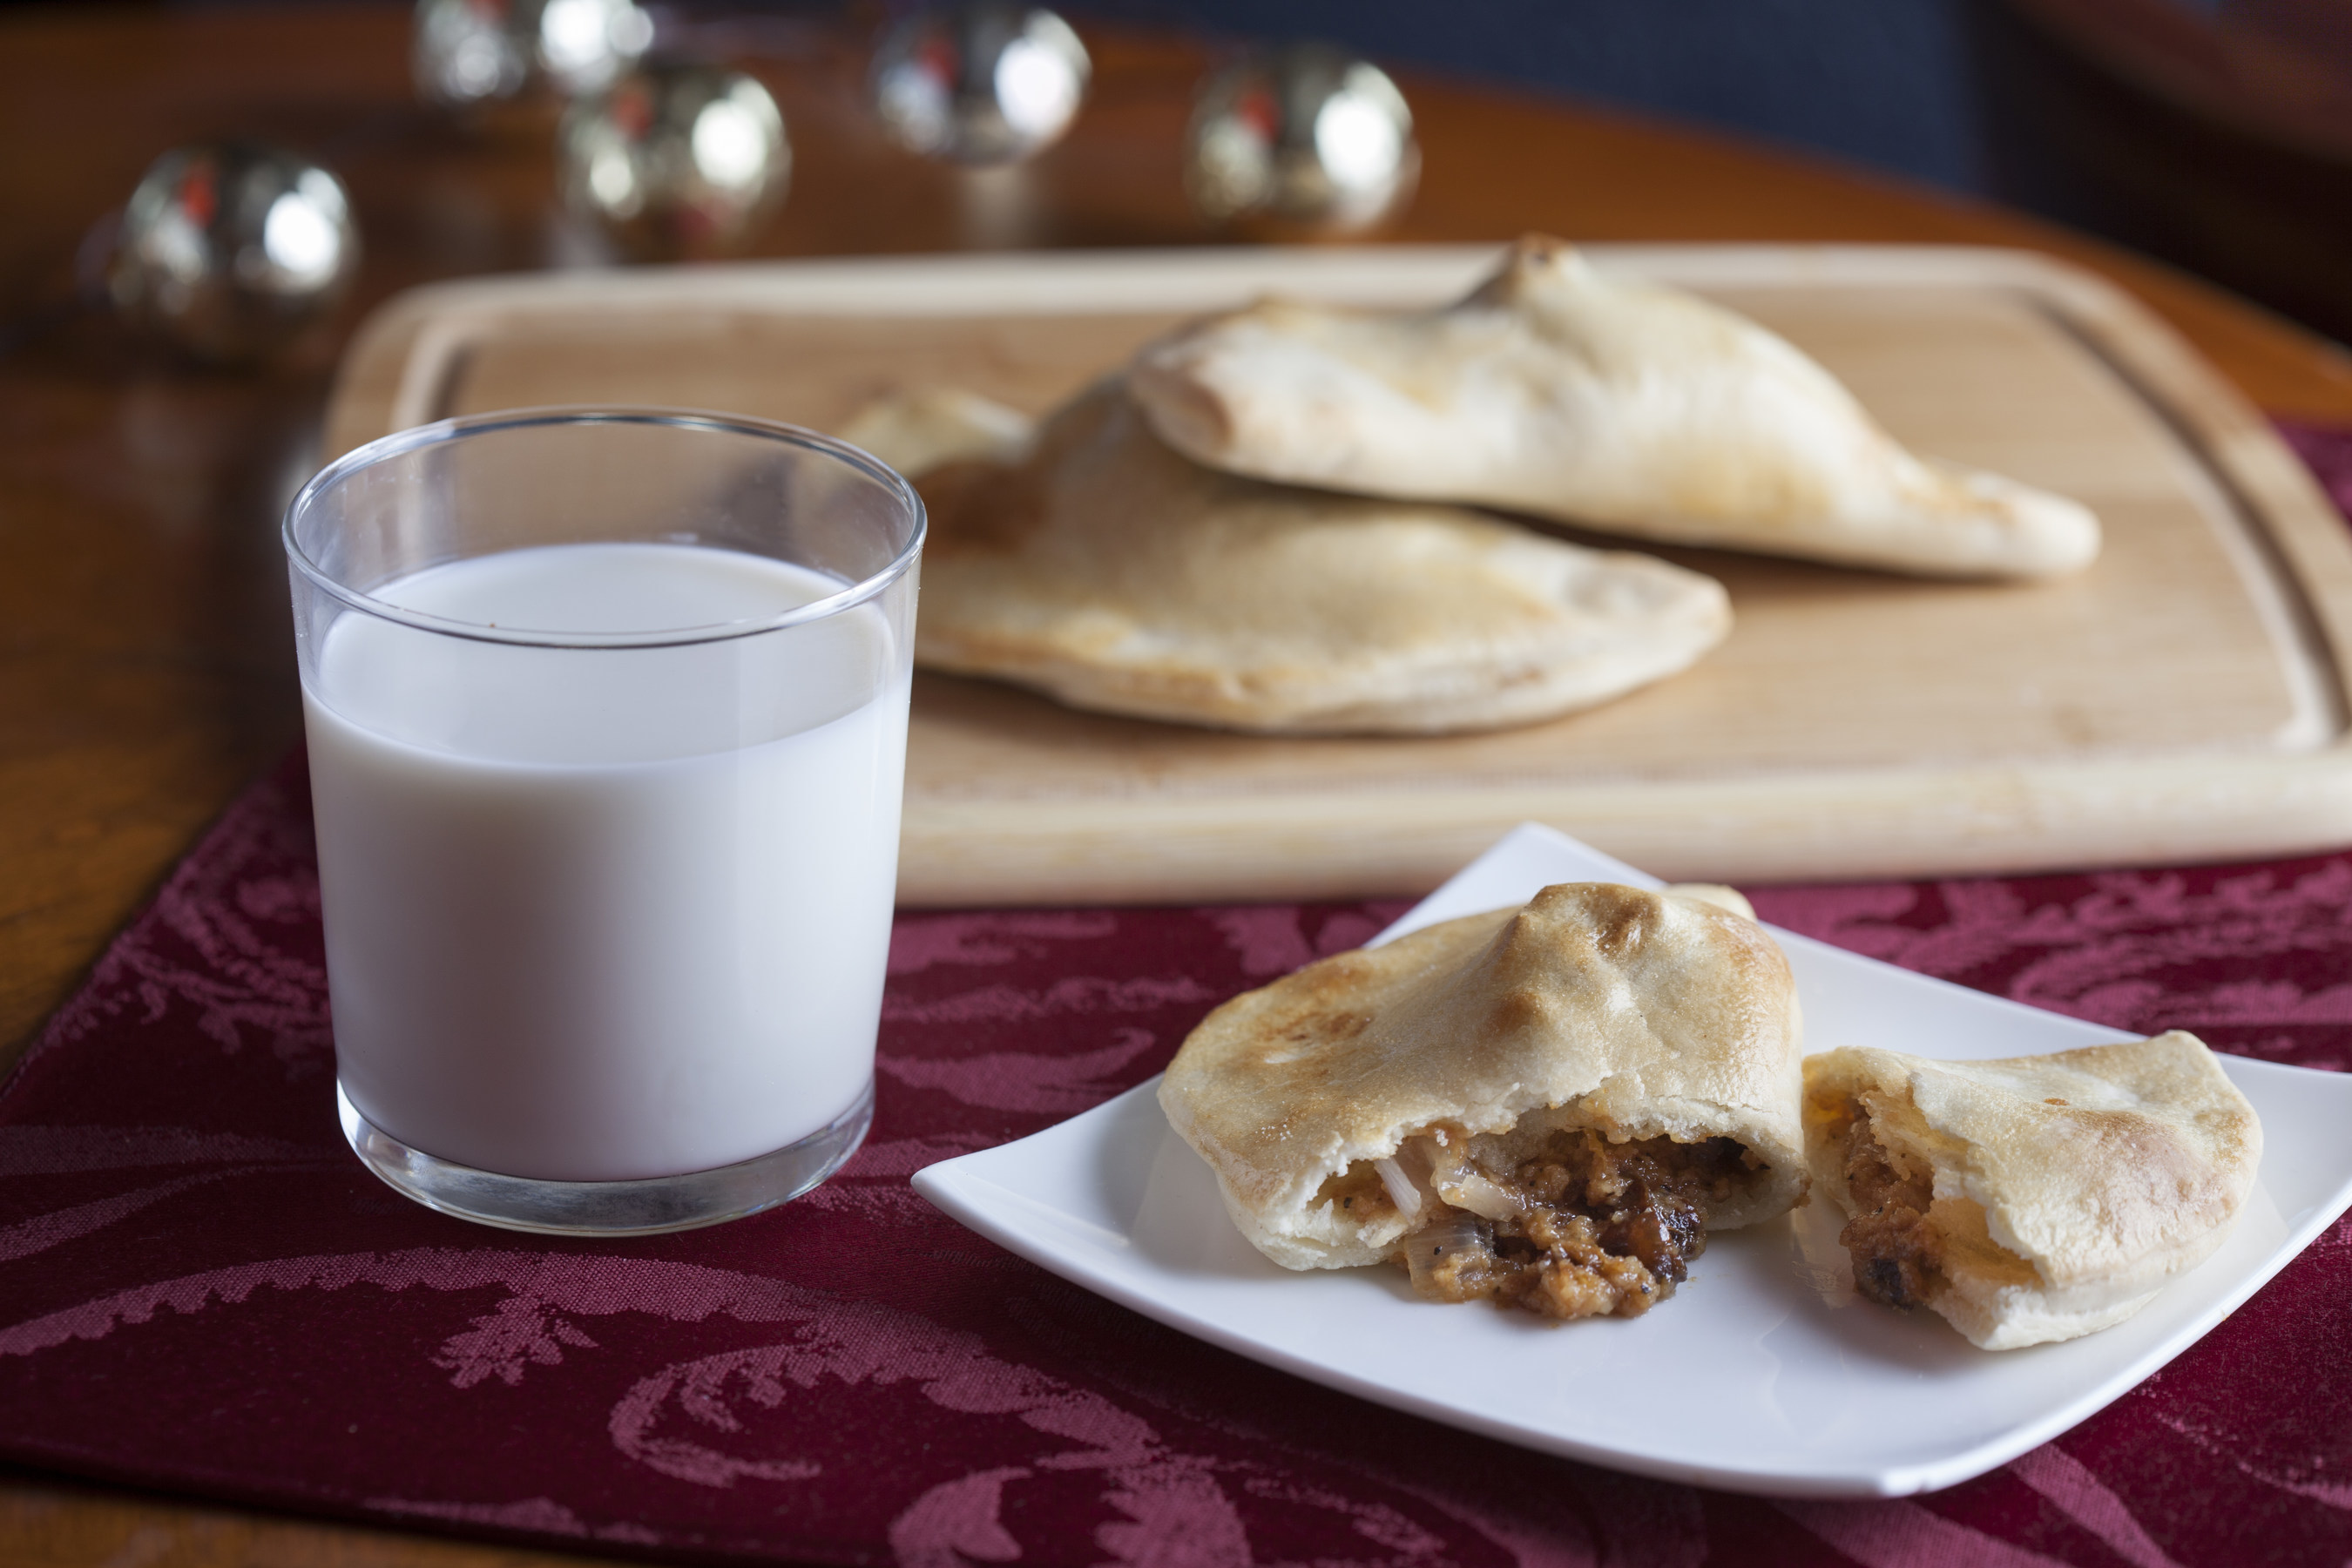 Sweet and Savory Breakfast Empanadas + Milk, by Chef Pablo Romano